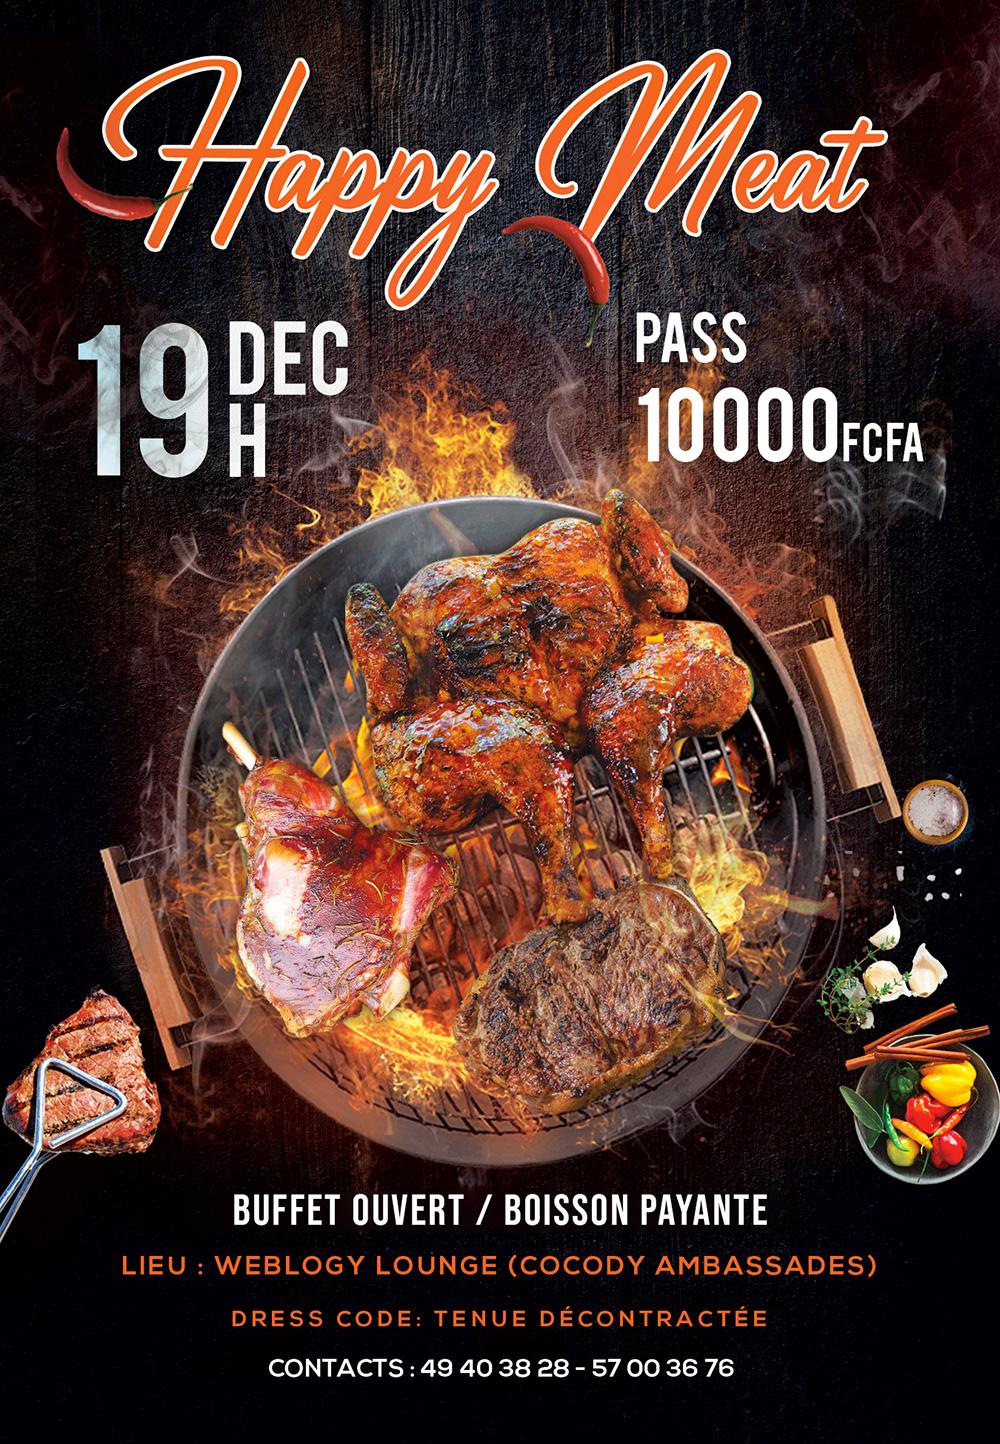 https://ads.weblogy.net/clients/Agenda/Event-images/Agd-Happy-Meat-16122020.jpg